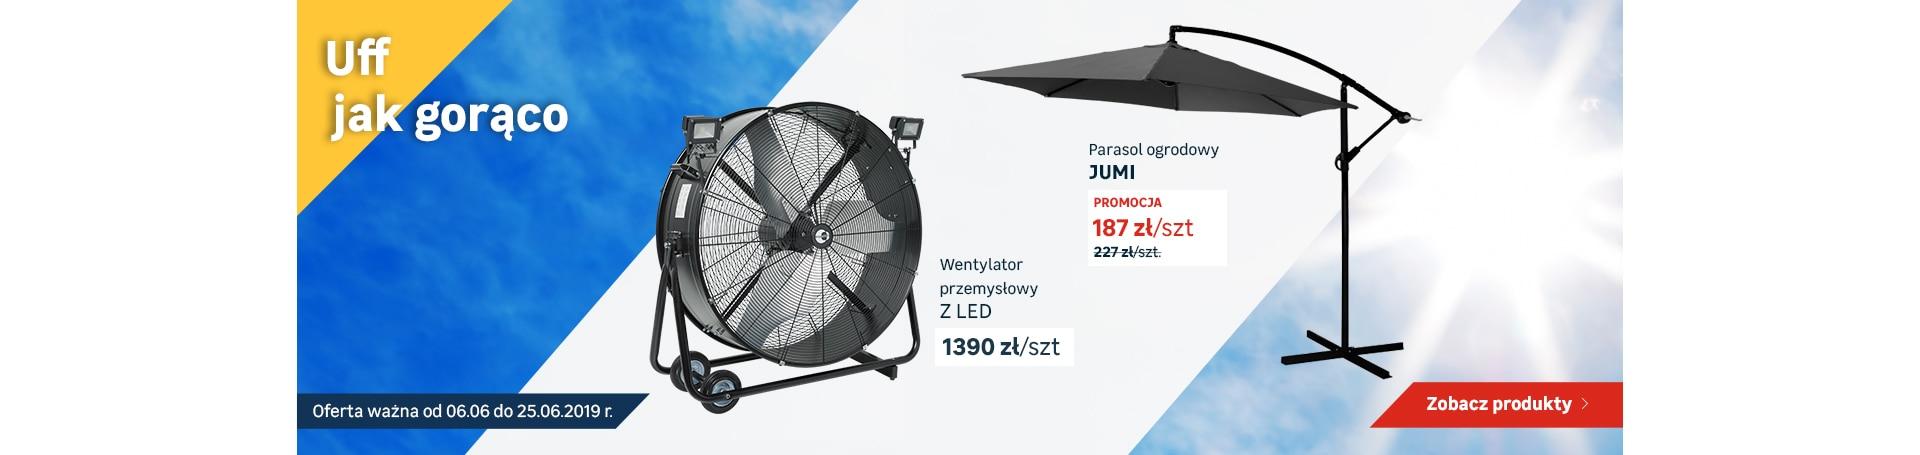 pp-uff-jak-goraco-05.06-18.06.2019-1323x455